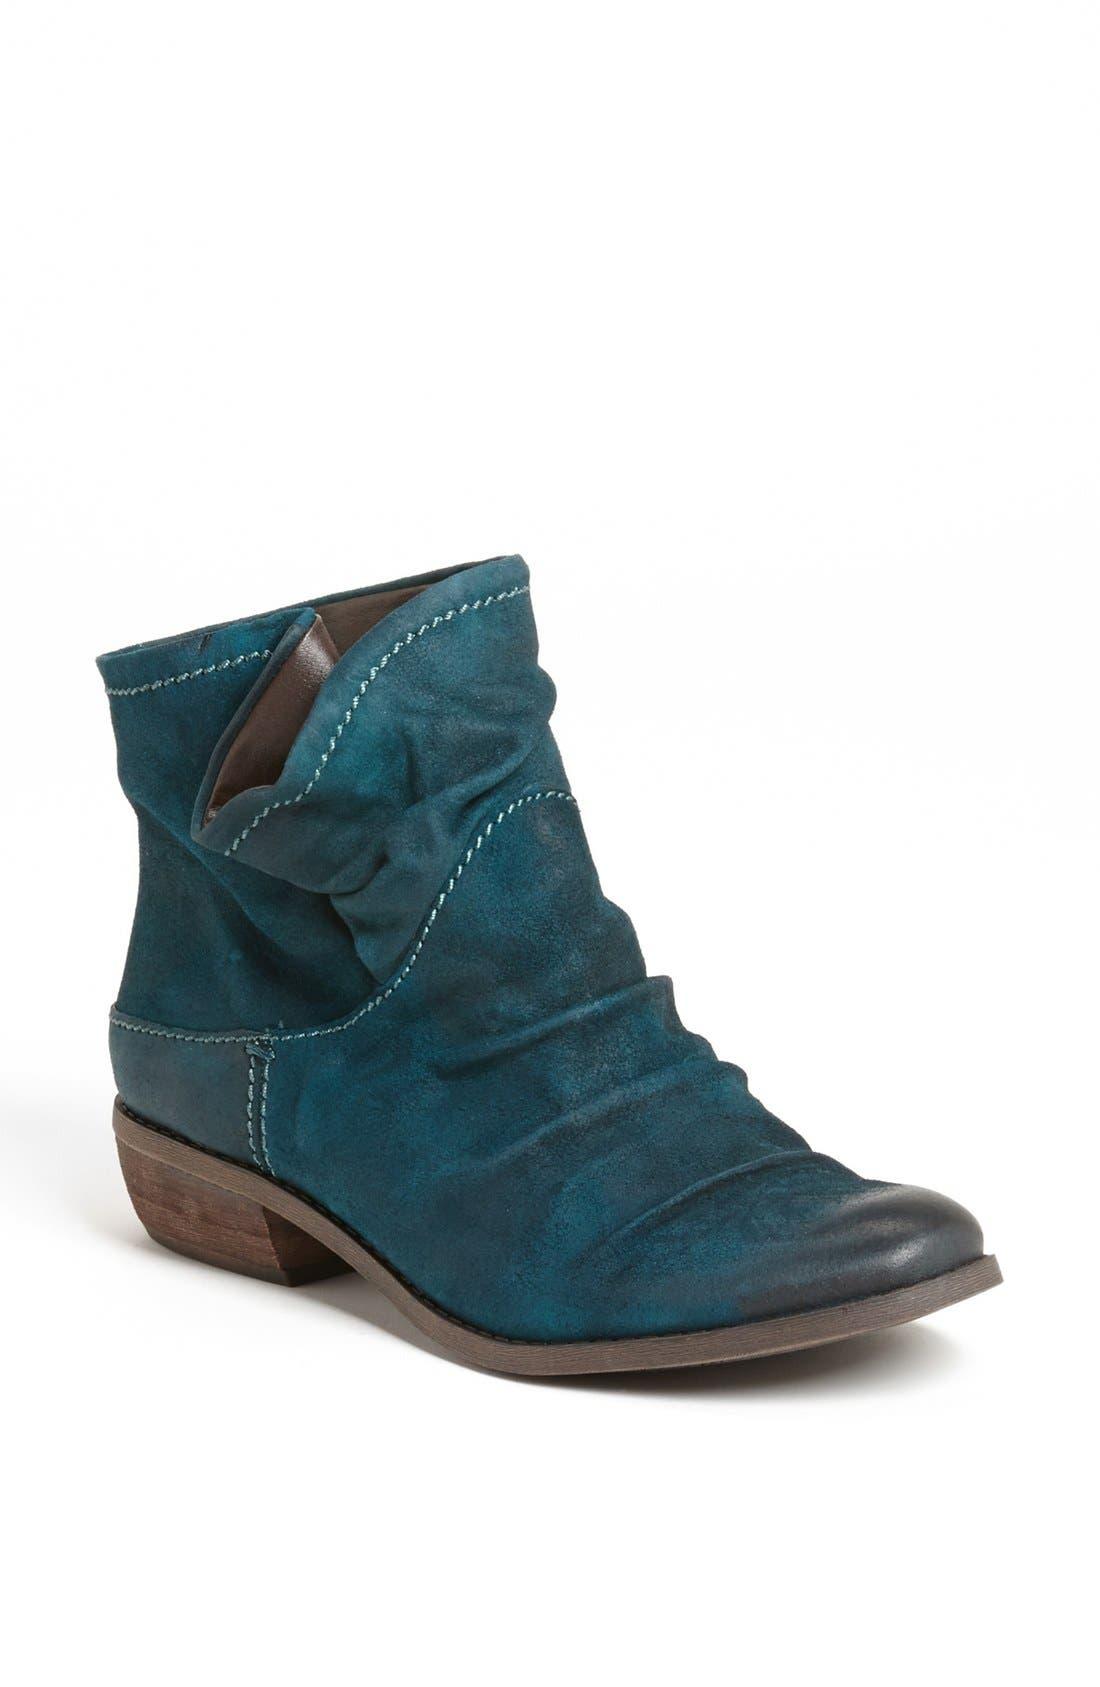 Main Image - Fergie 'Monet' Boot